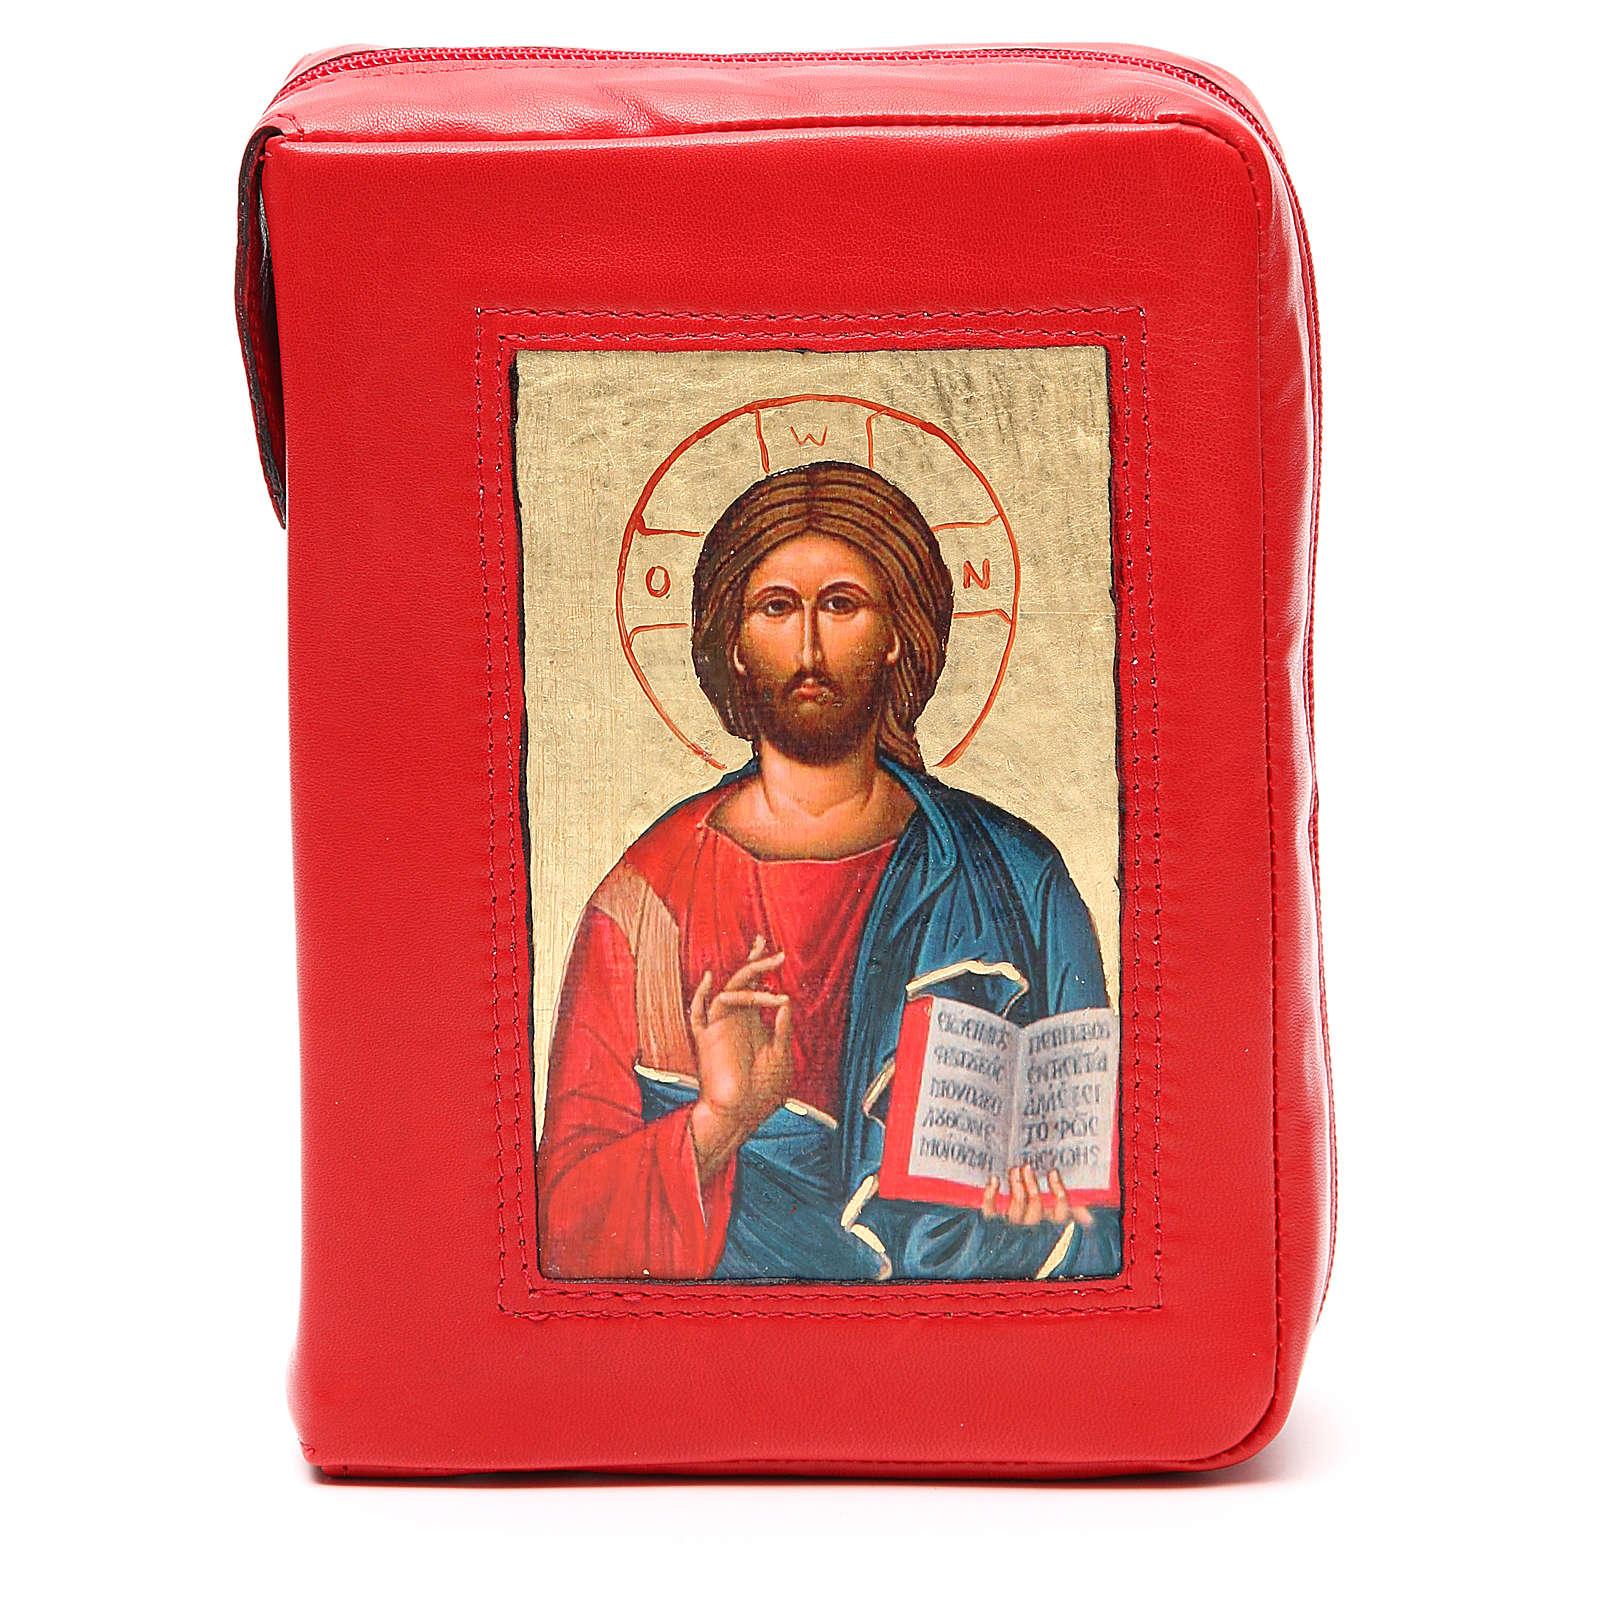 Custodia Bibbia Ger. Pelle rossa Pantocratore Pictografia 4